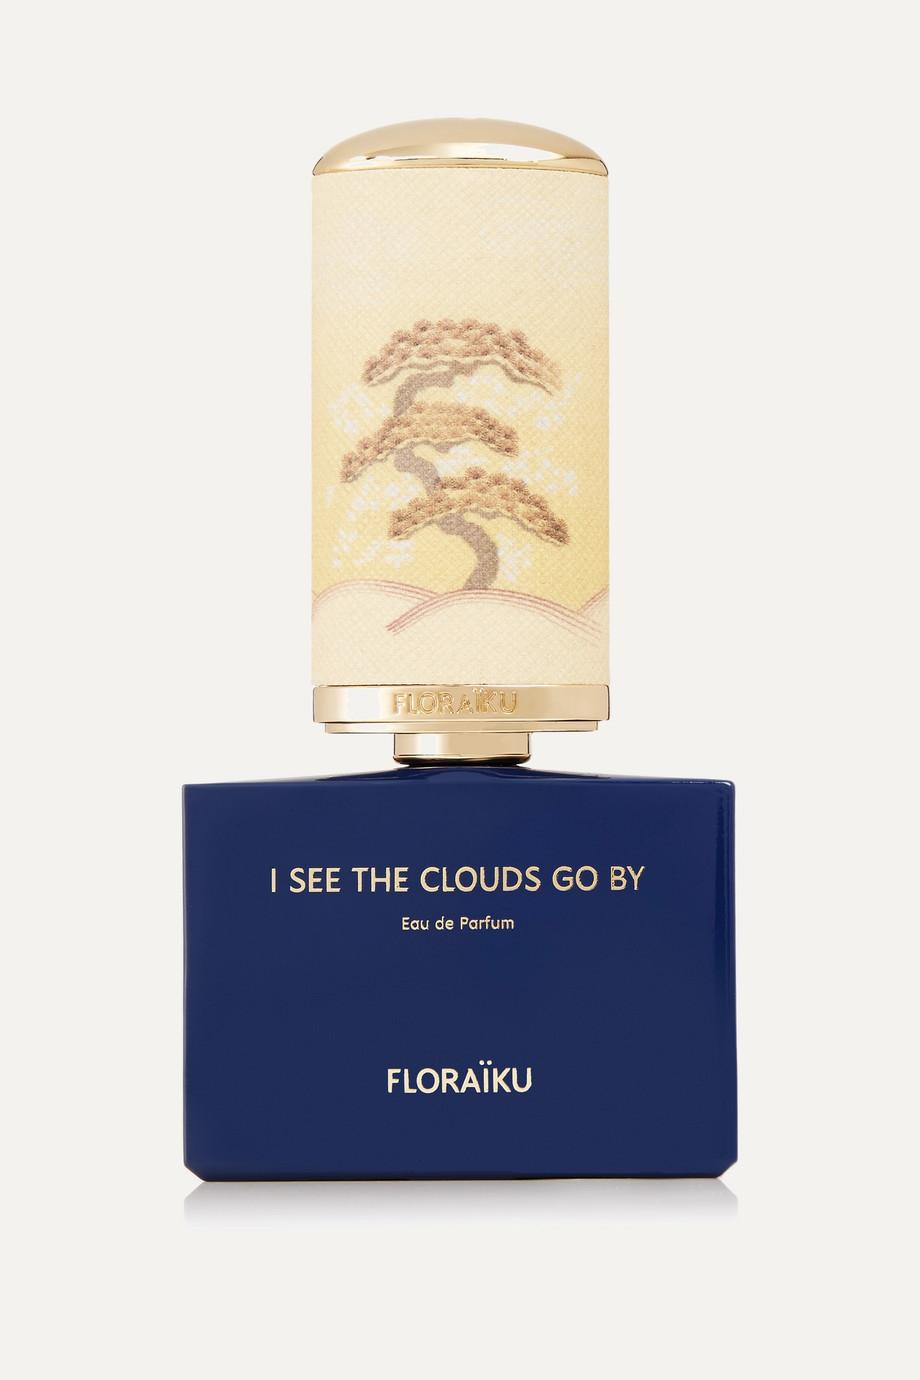 Floraiku I See The Clouds Go By, 50 ml & 10 ml – Eau de Parfum